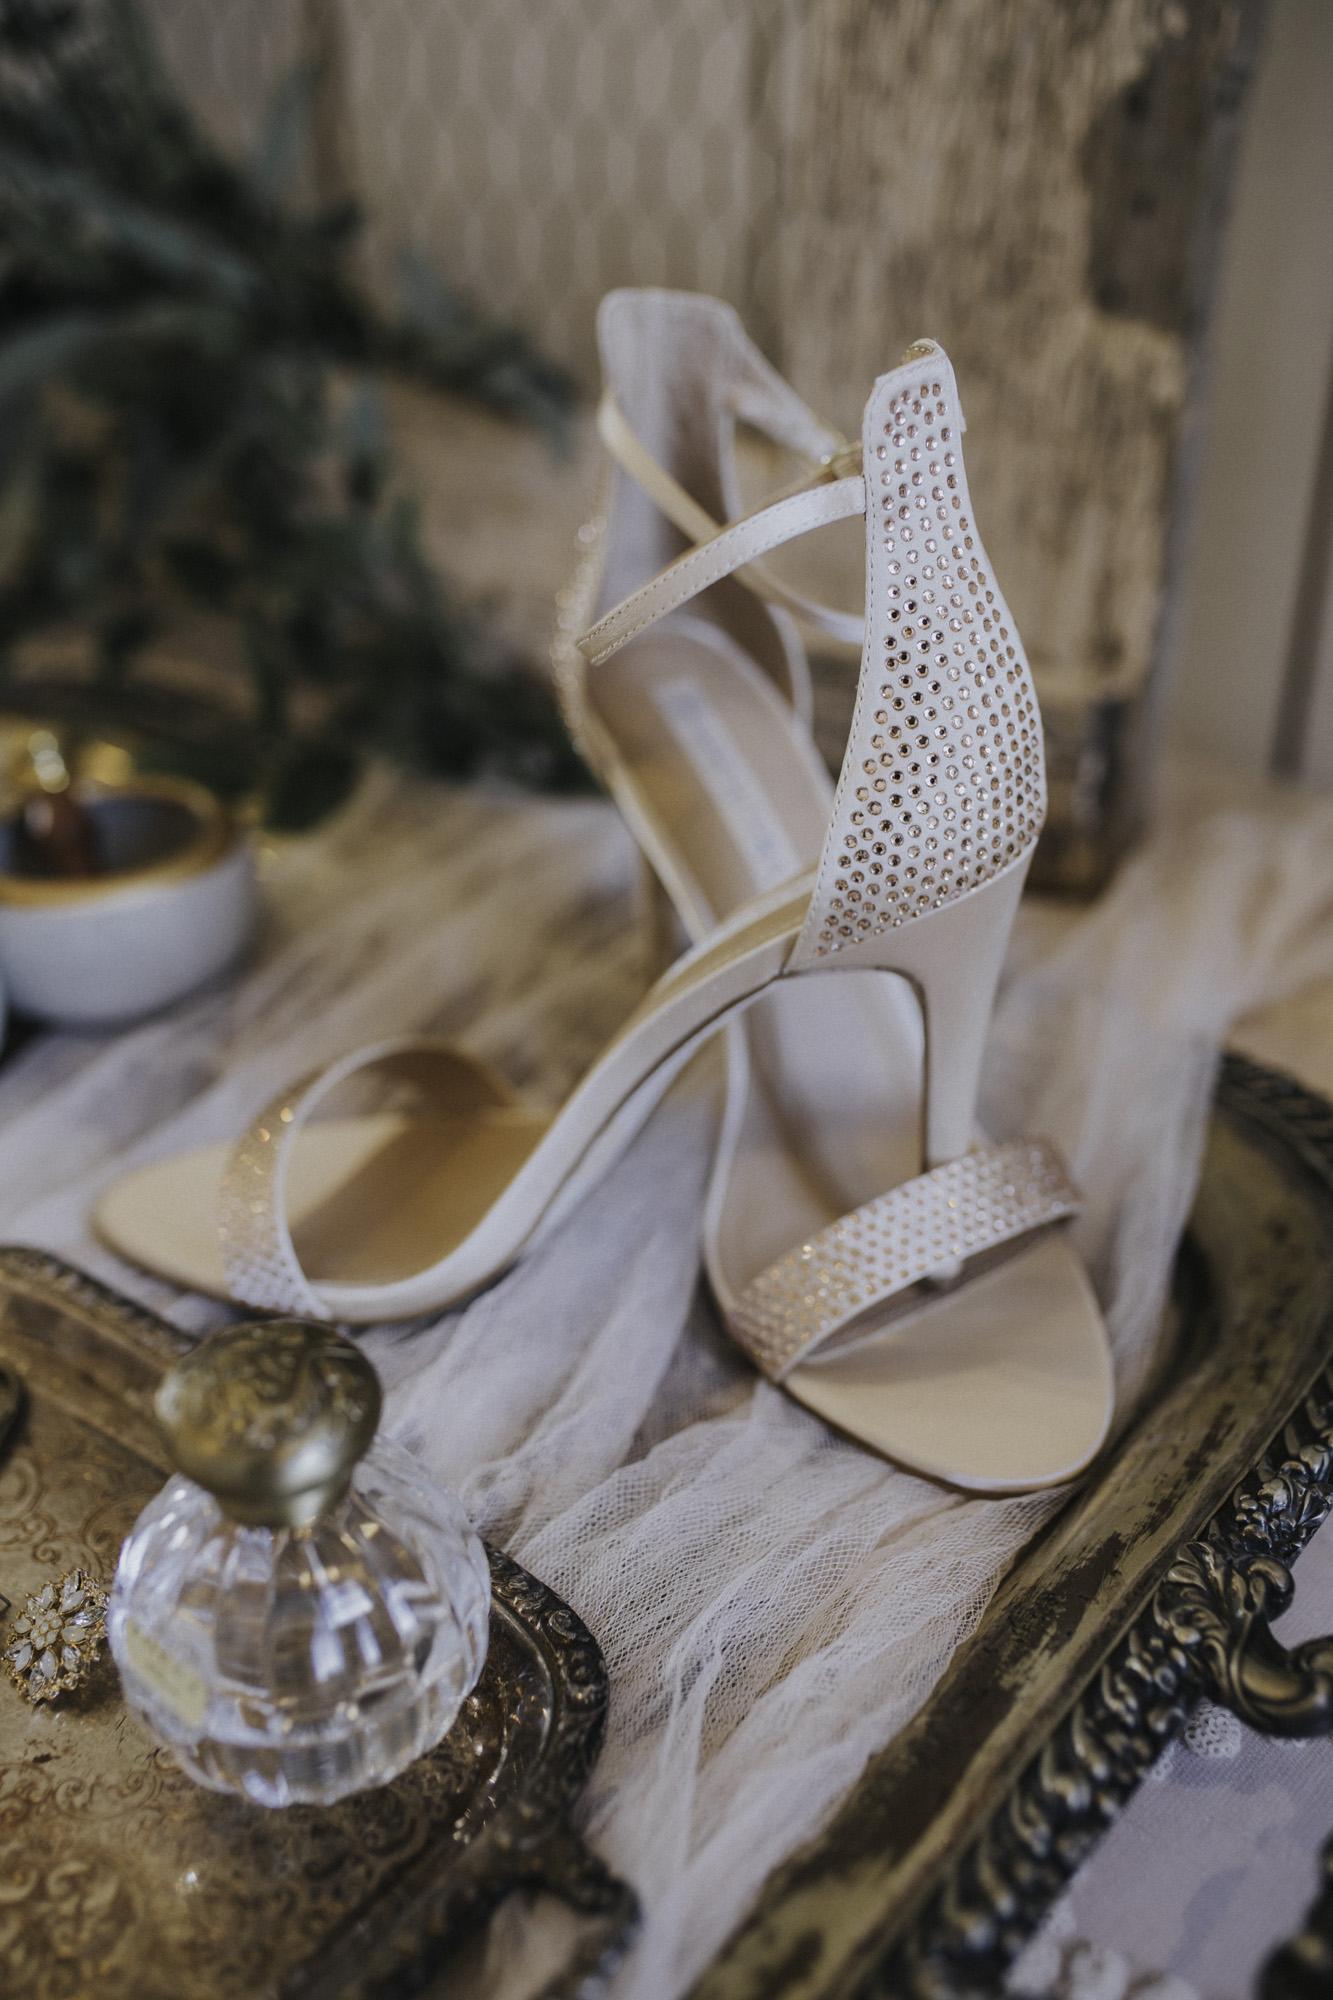 Cate_Ann_Photography_Dayton_Ohio_Wedding_Elopement_And_Engagement_PhotographerIMG_7845.jpg